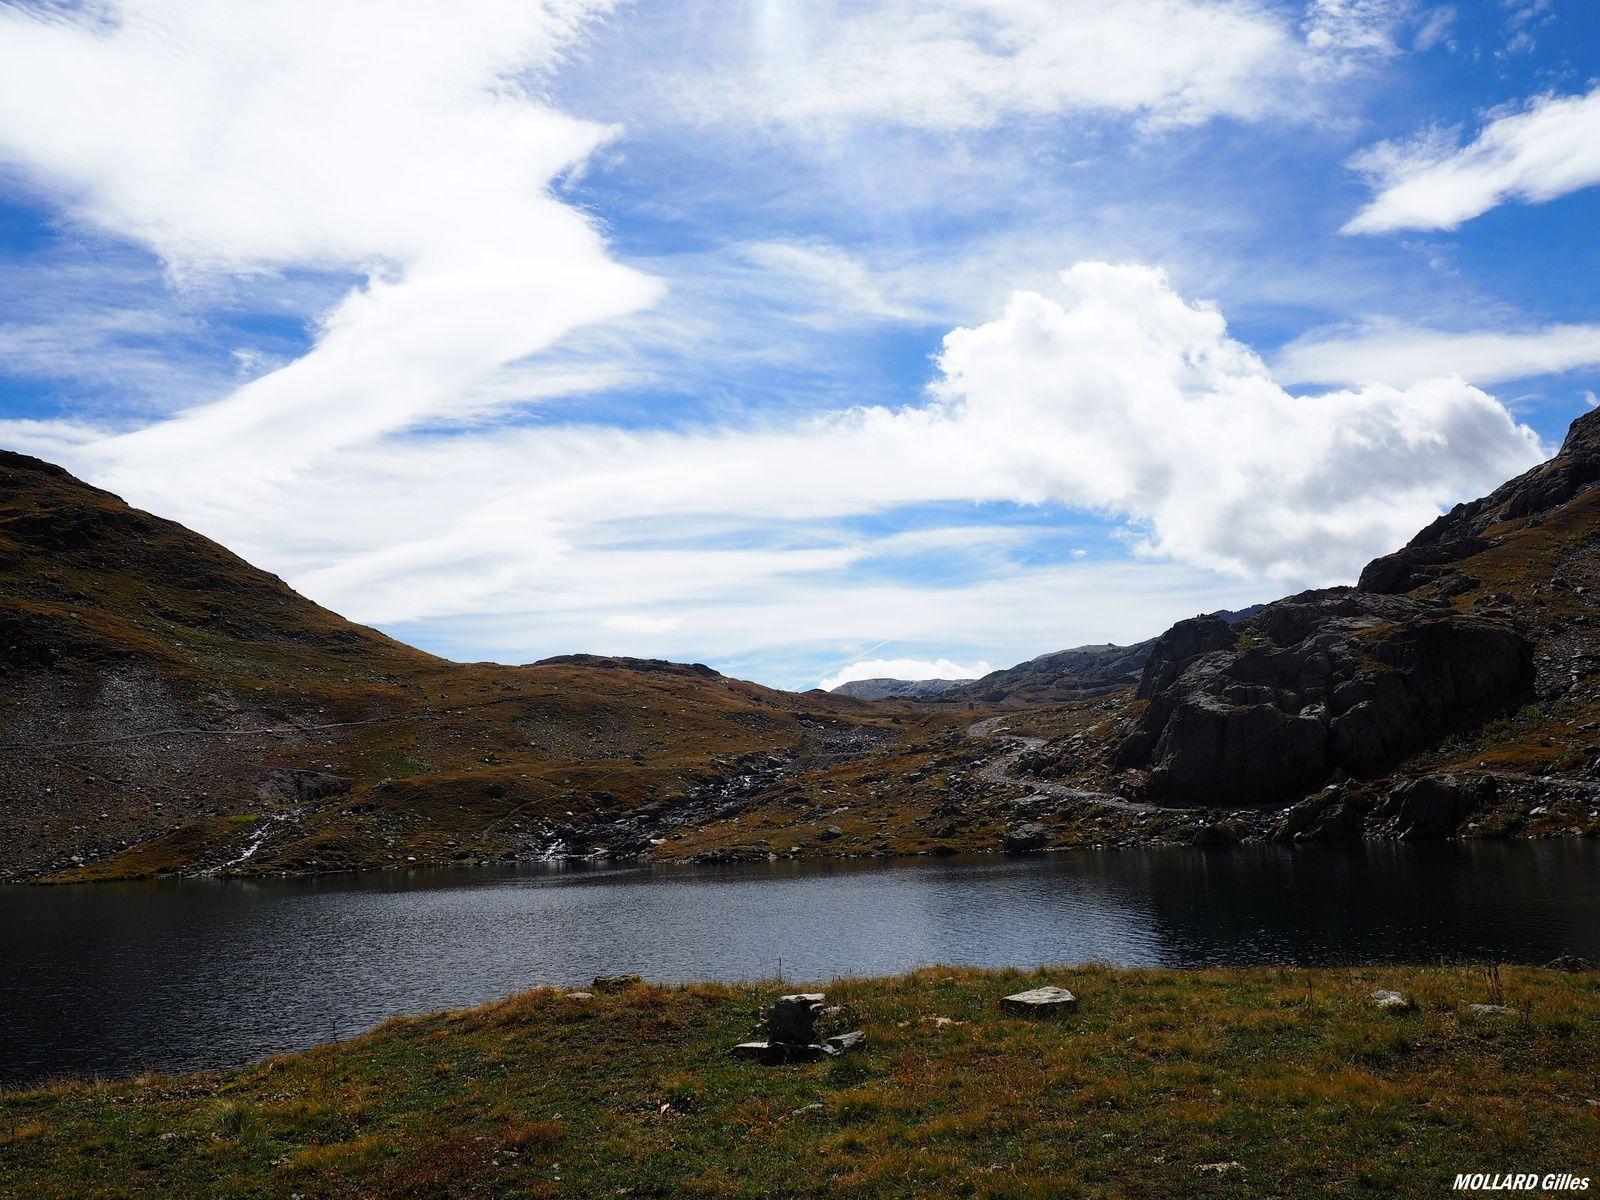 Les lacs Bramant ,glacier de St Sorlin.